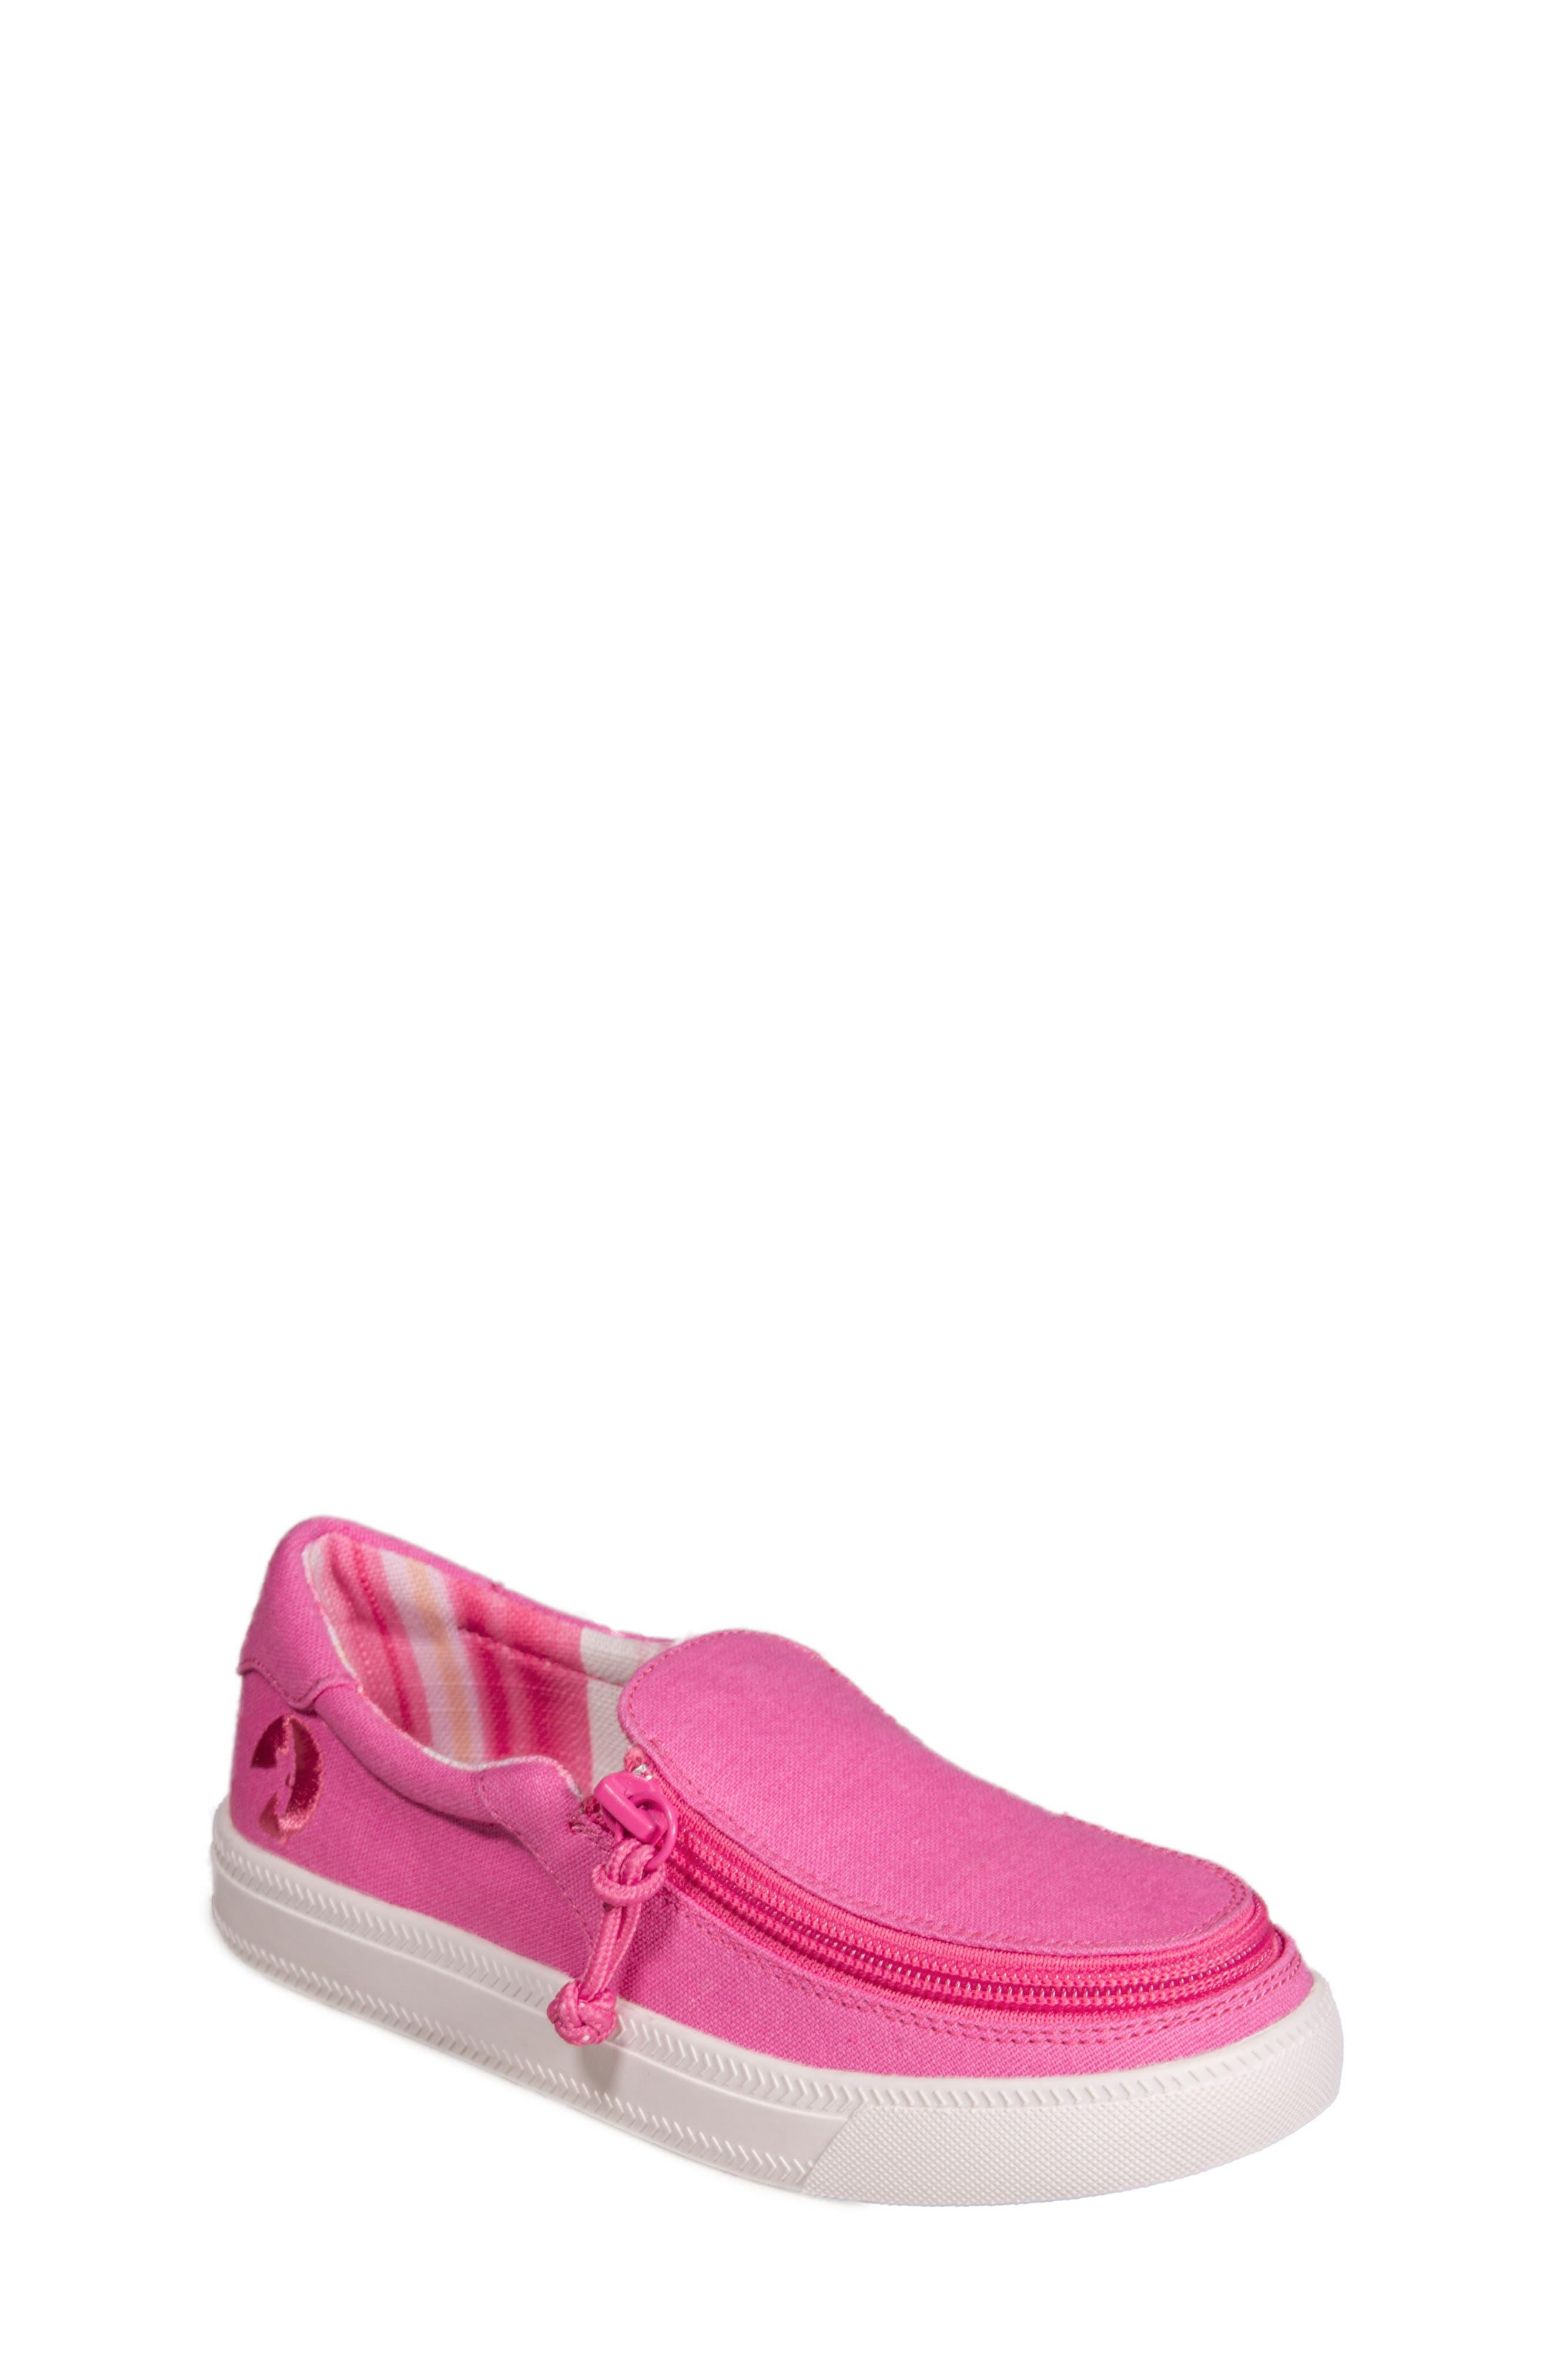 BILLY FOOTWEAR Zip Around Low Top Sneaker